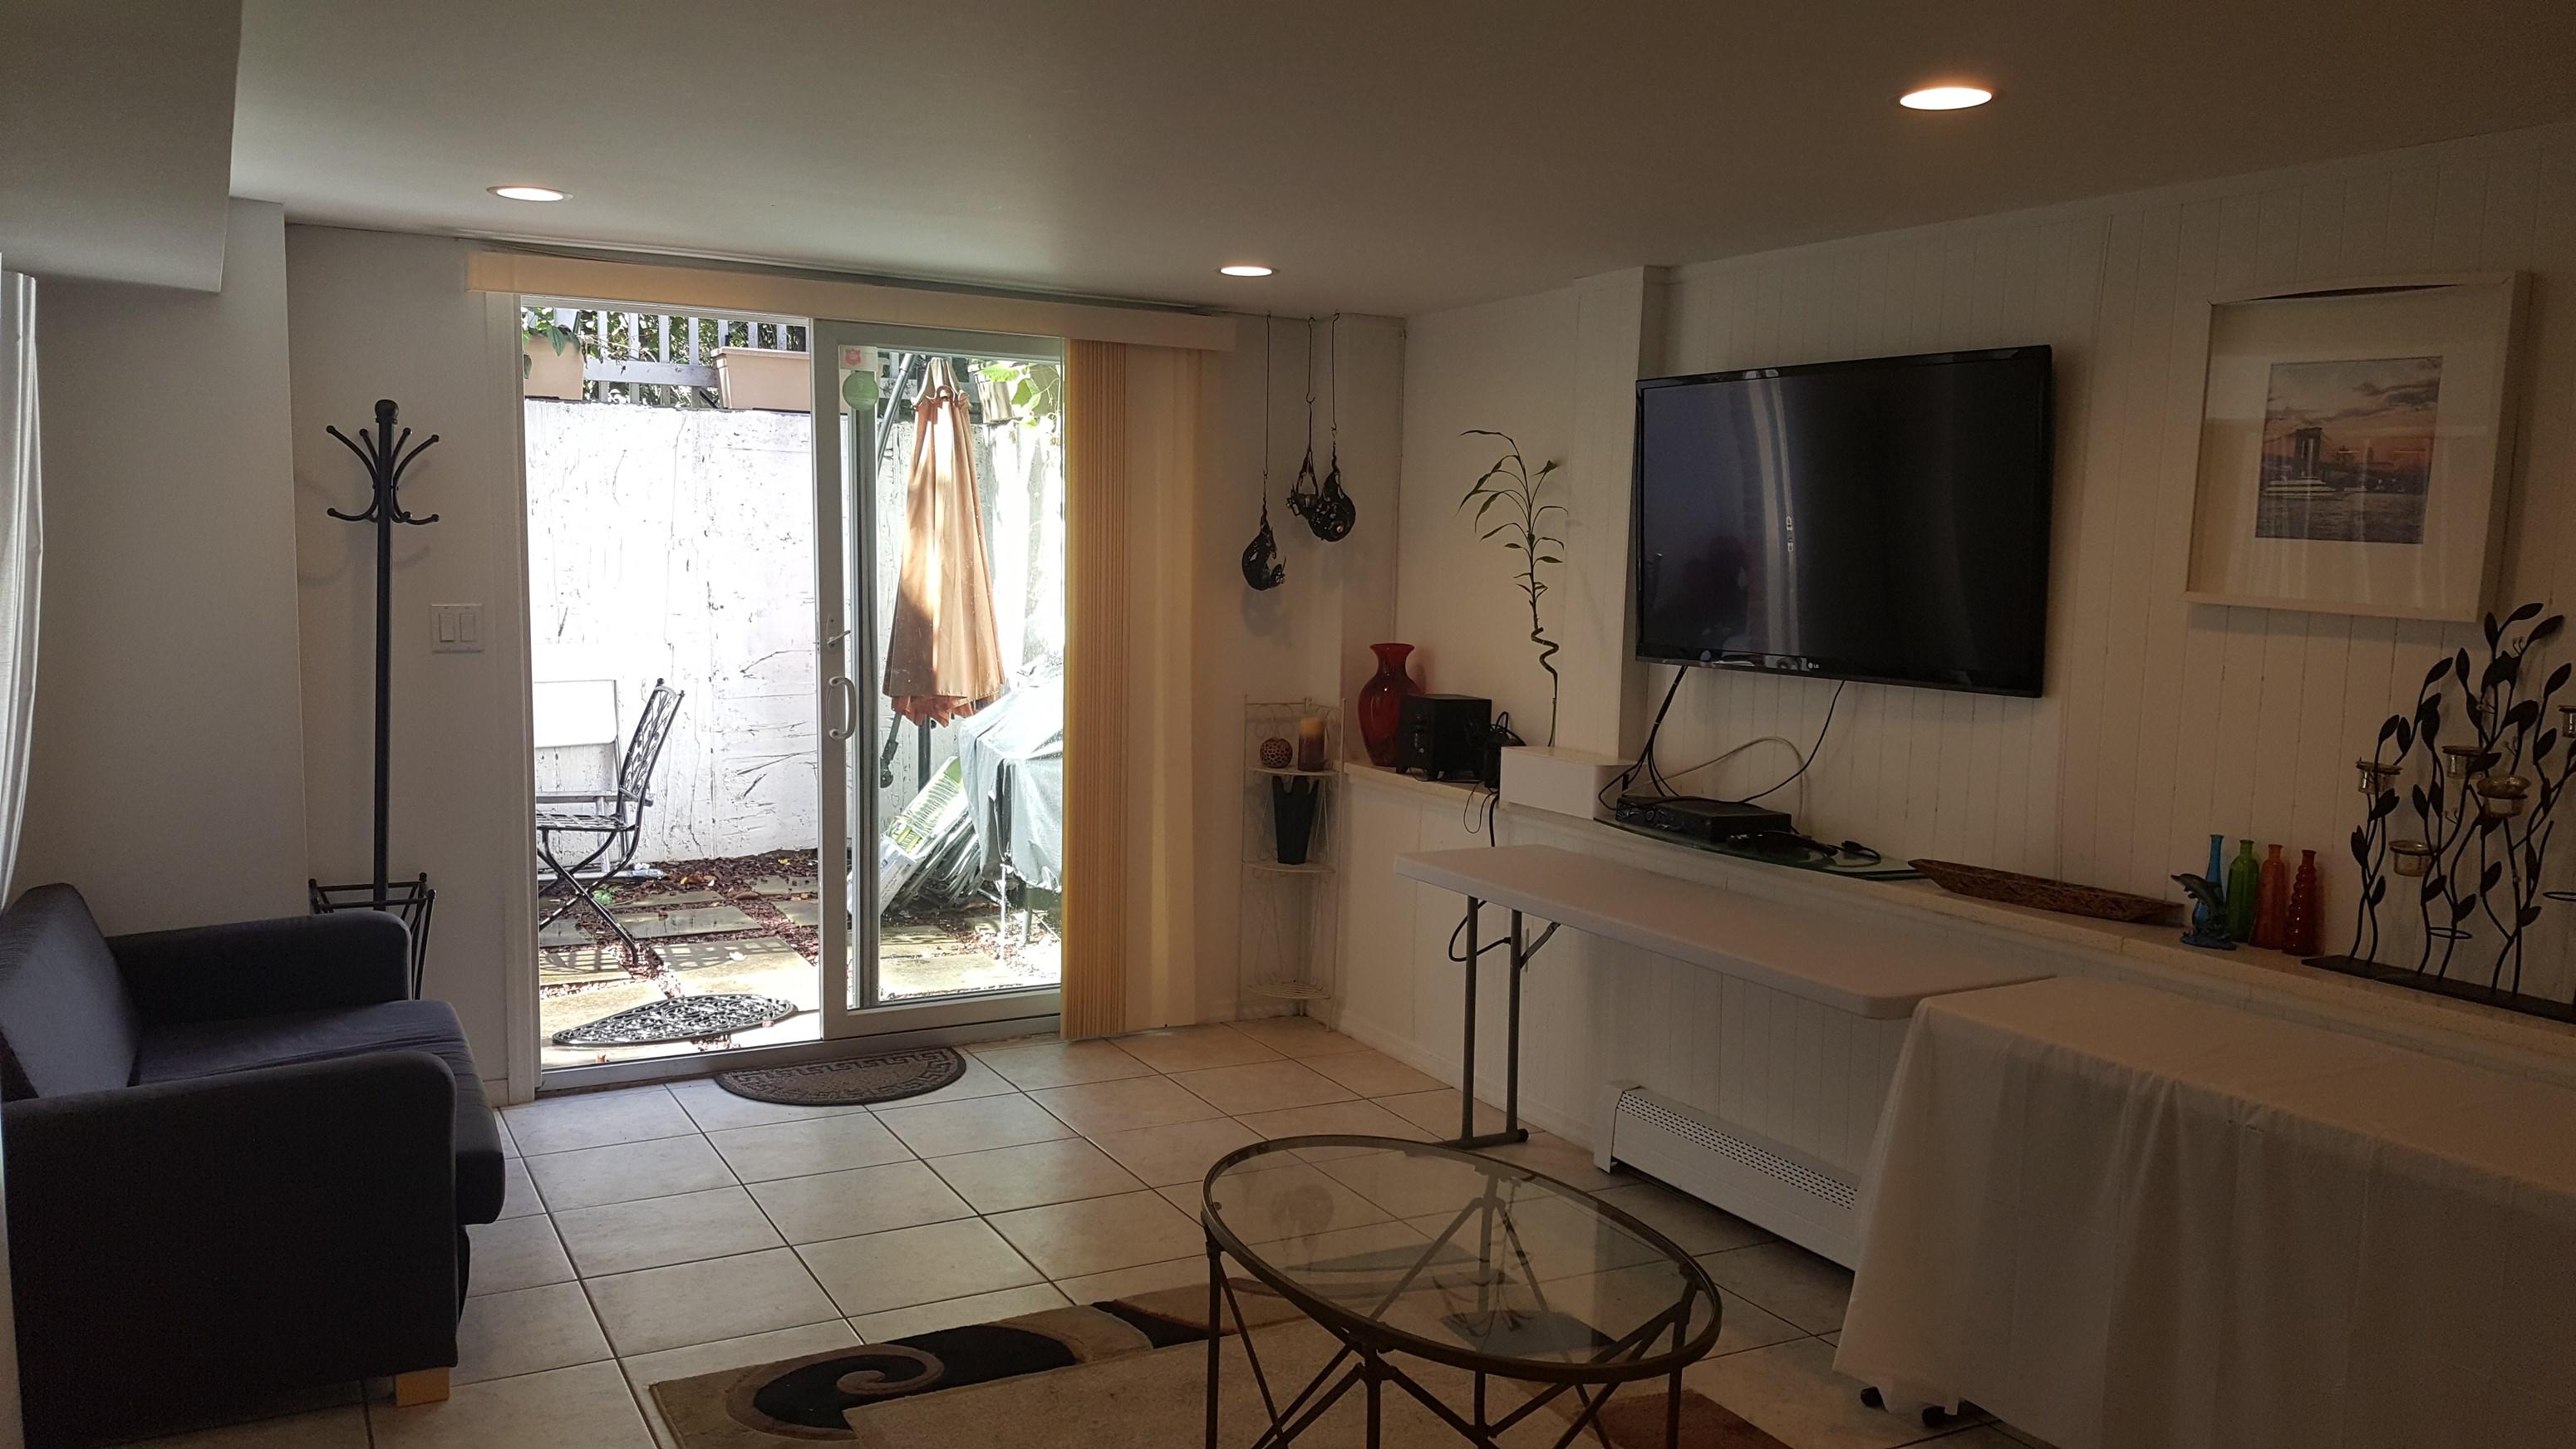 Private Modern Studio Apartment W/ ALL Amenities